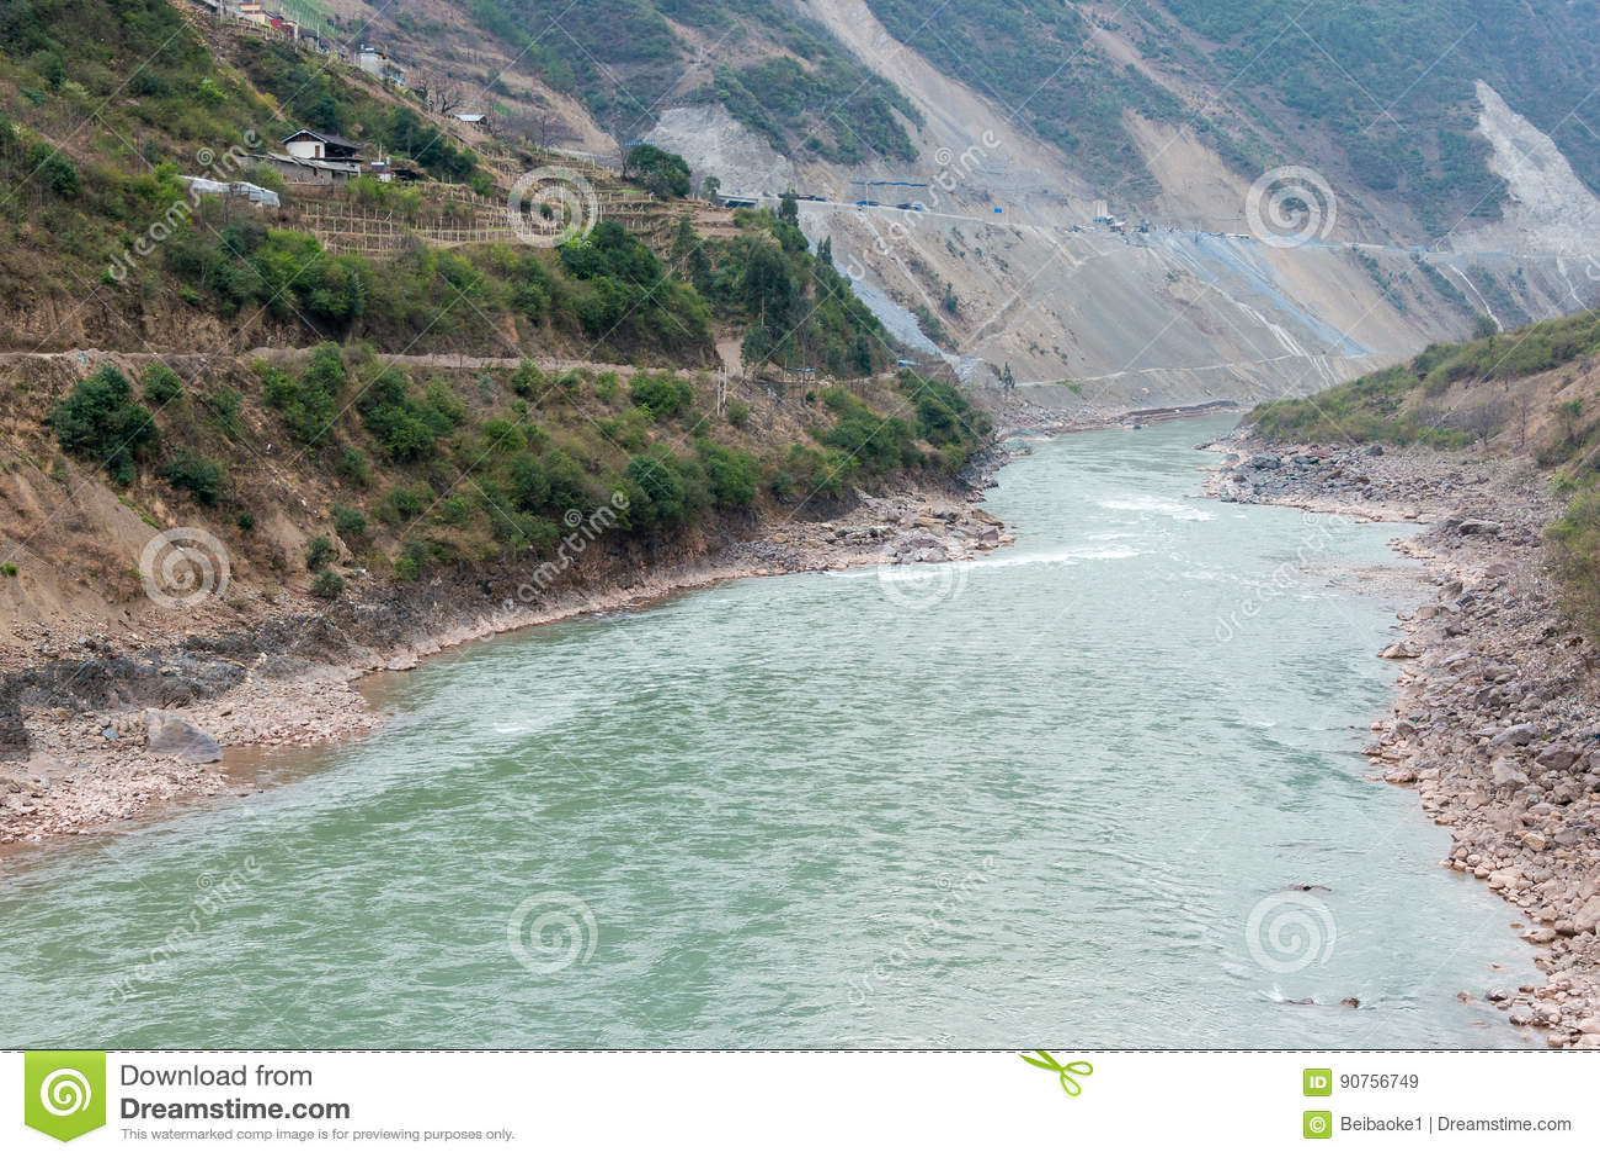 DIQING, CINA - 18 MARZO 2015: Lancang River un vil tibetano famoso